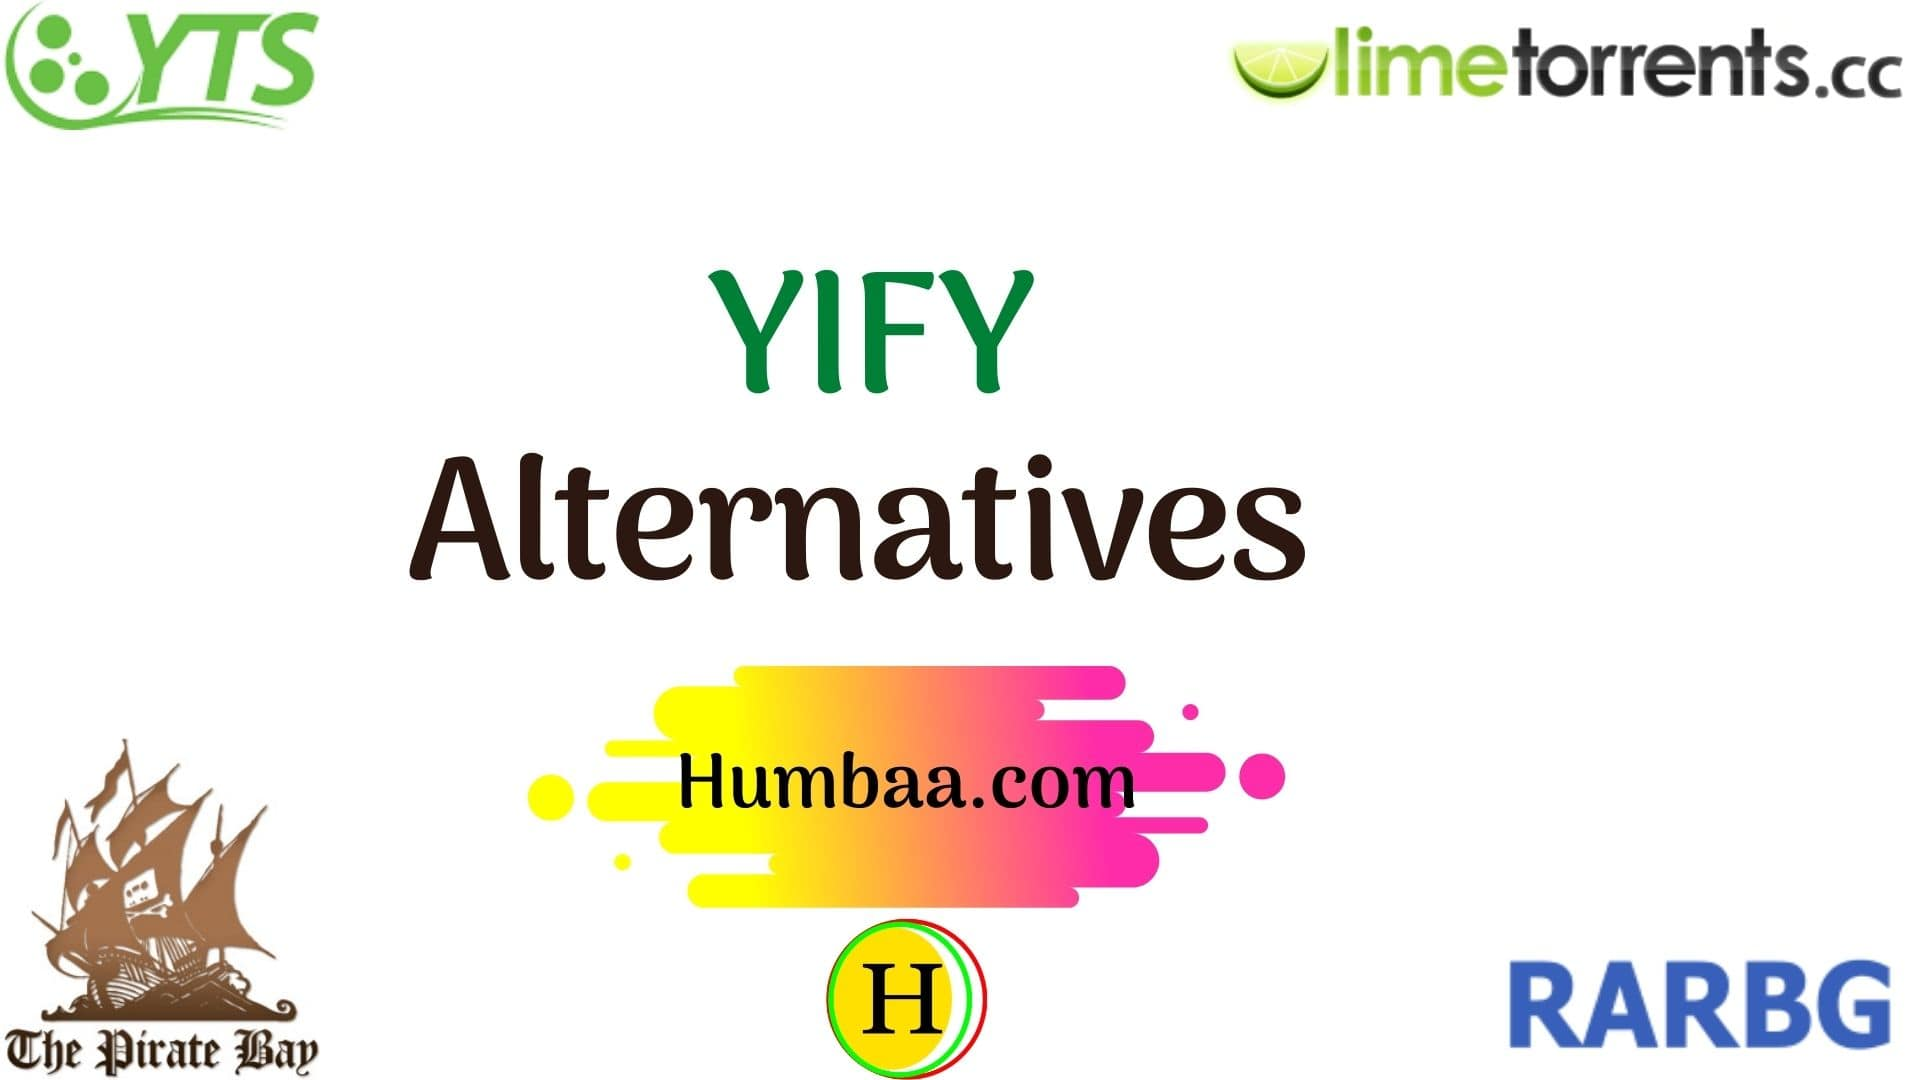 YIFY alternative